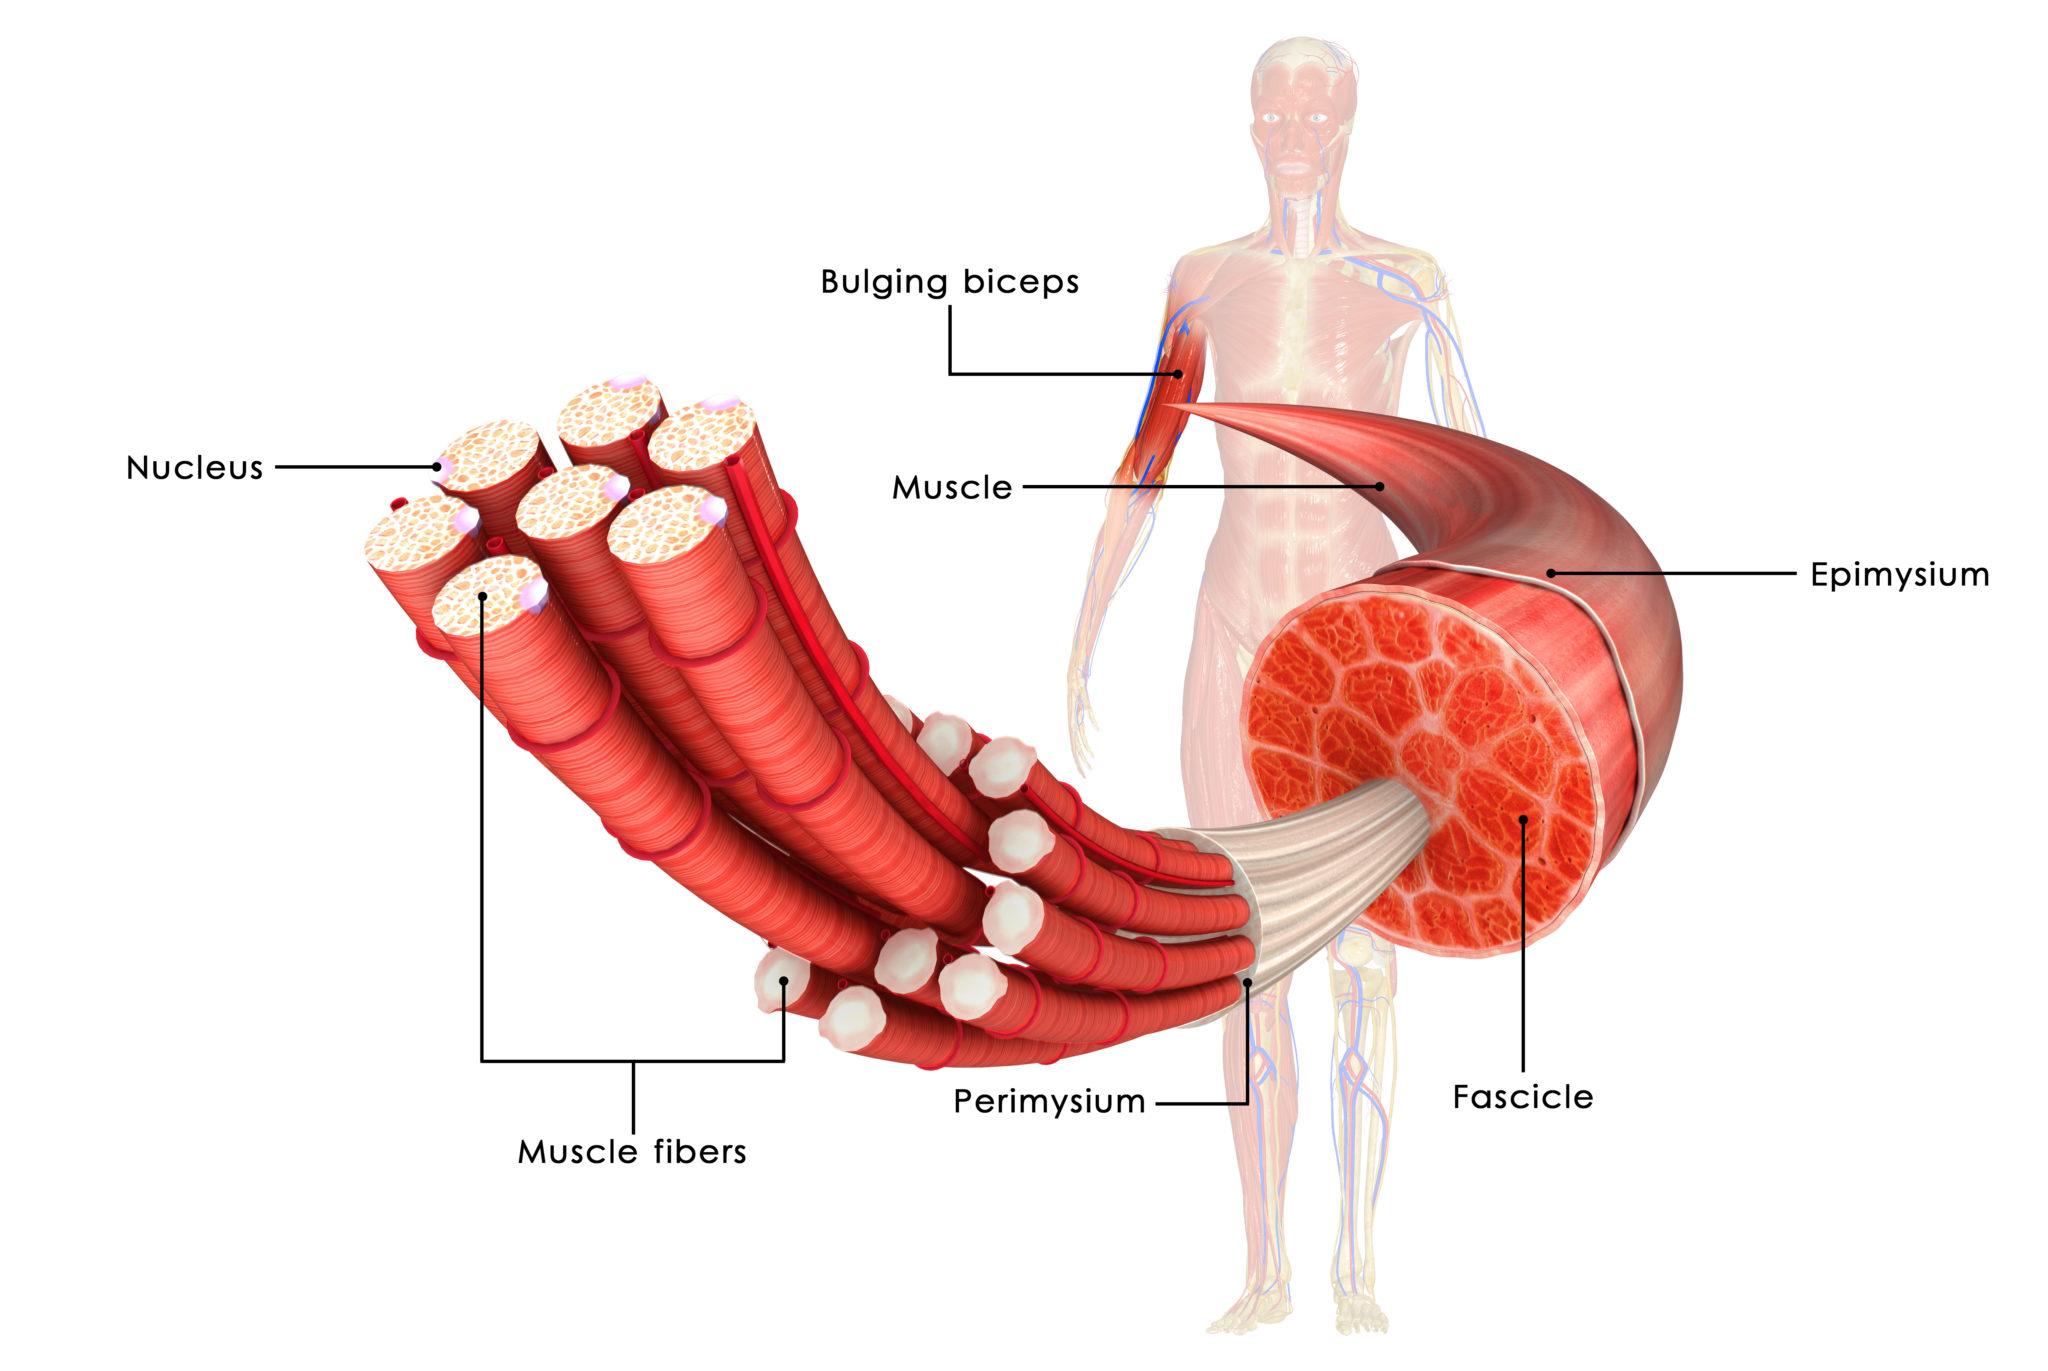 Muskel, Muskelbauch. Muskelfaser, Muskelfibrille